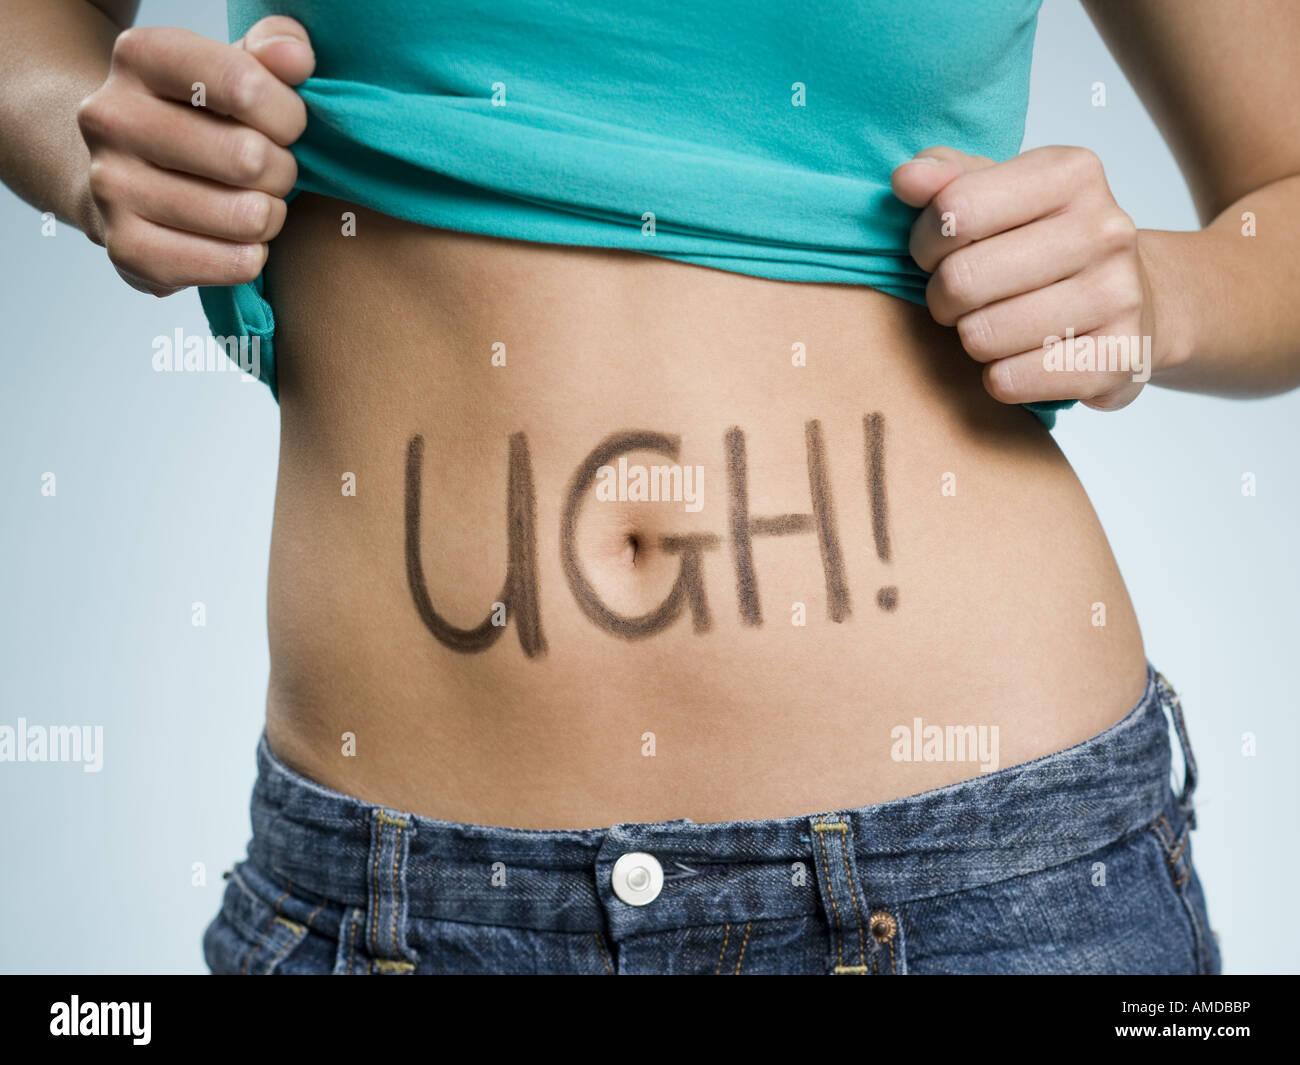 Female Abdomen with UGH! written on it - Stock Image